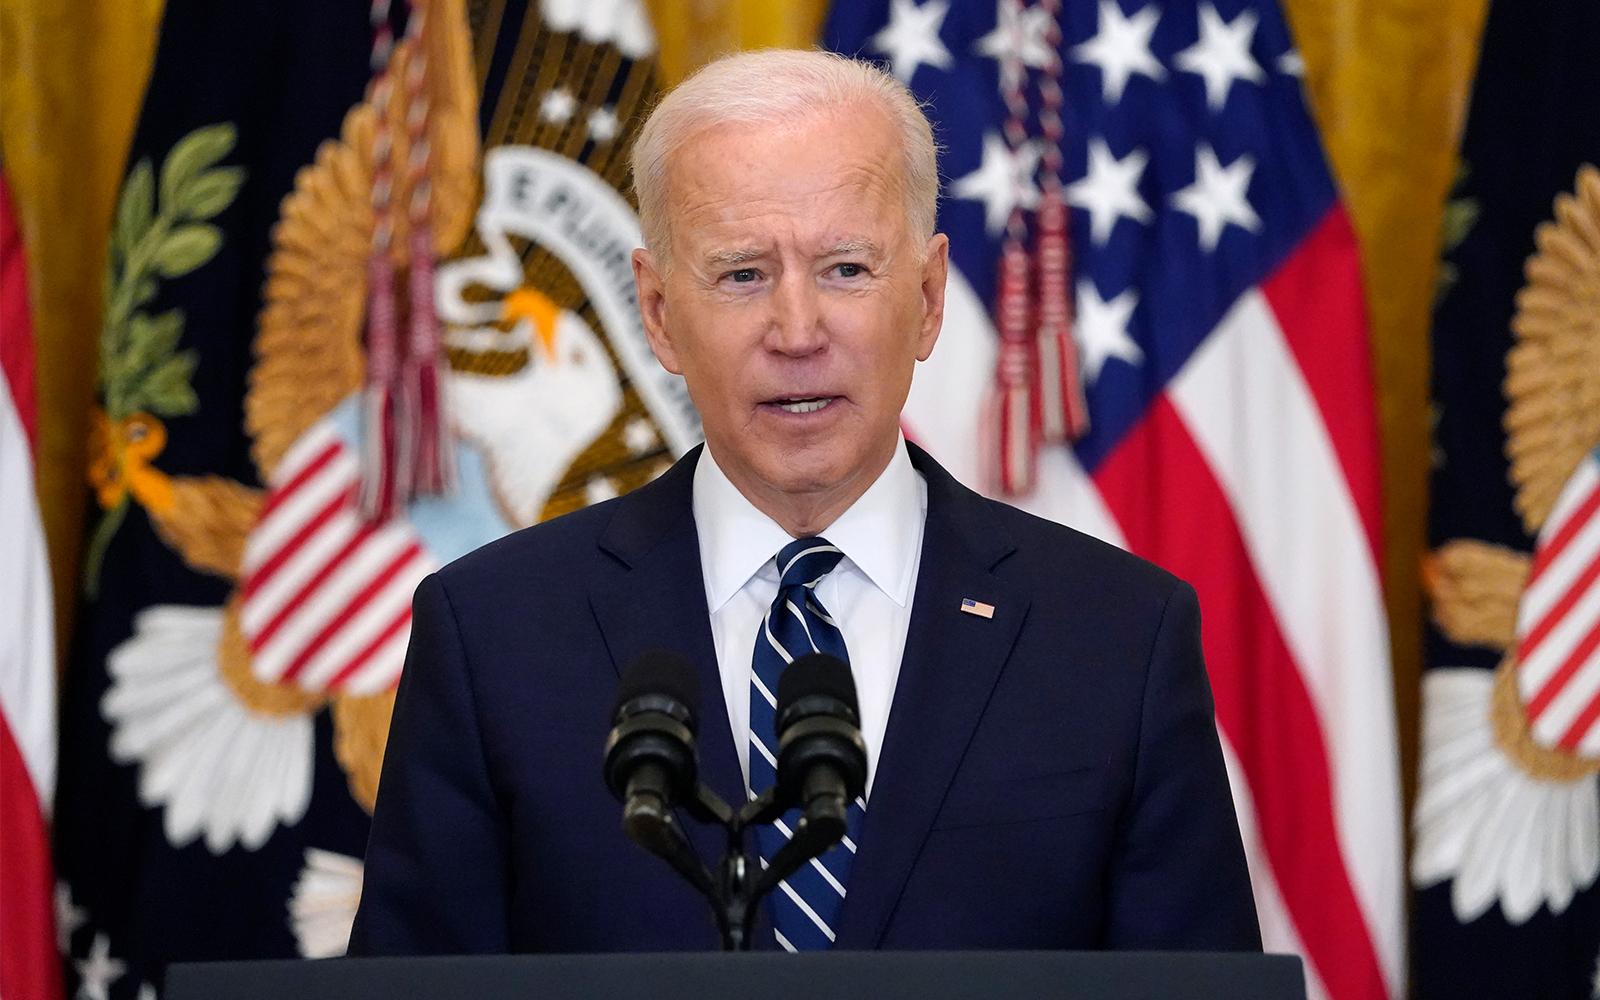 Joe Biden's First Press Conference As POTUS Faces Fire Over